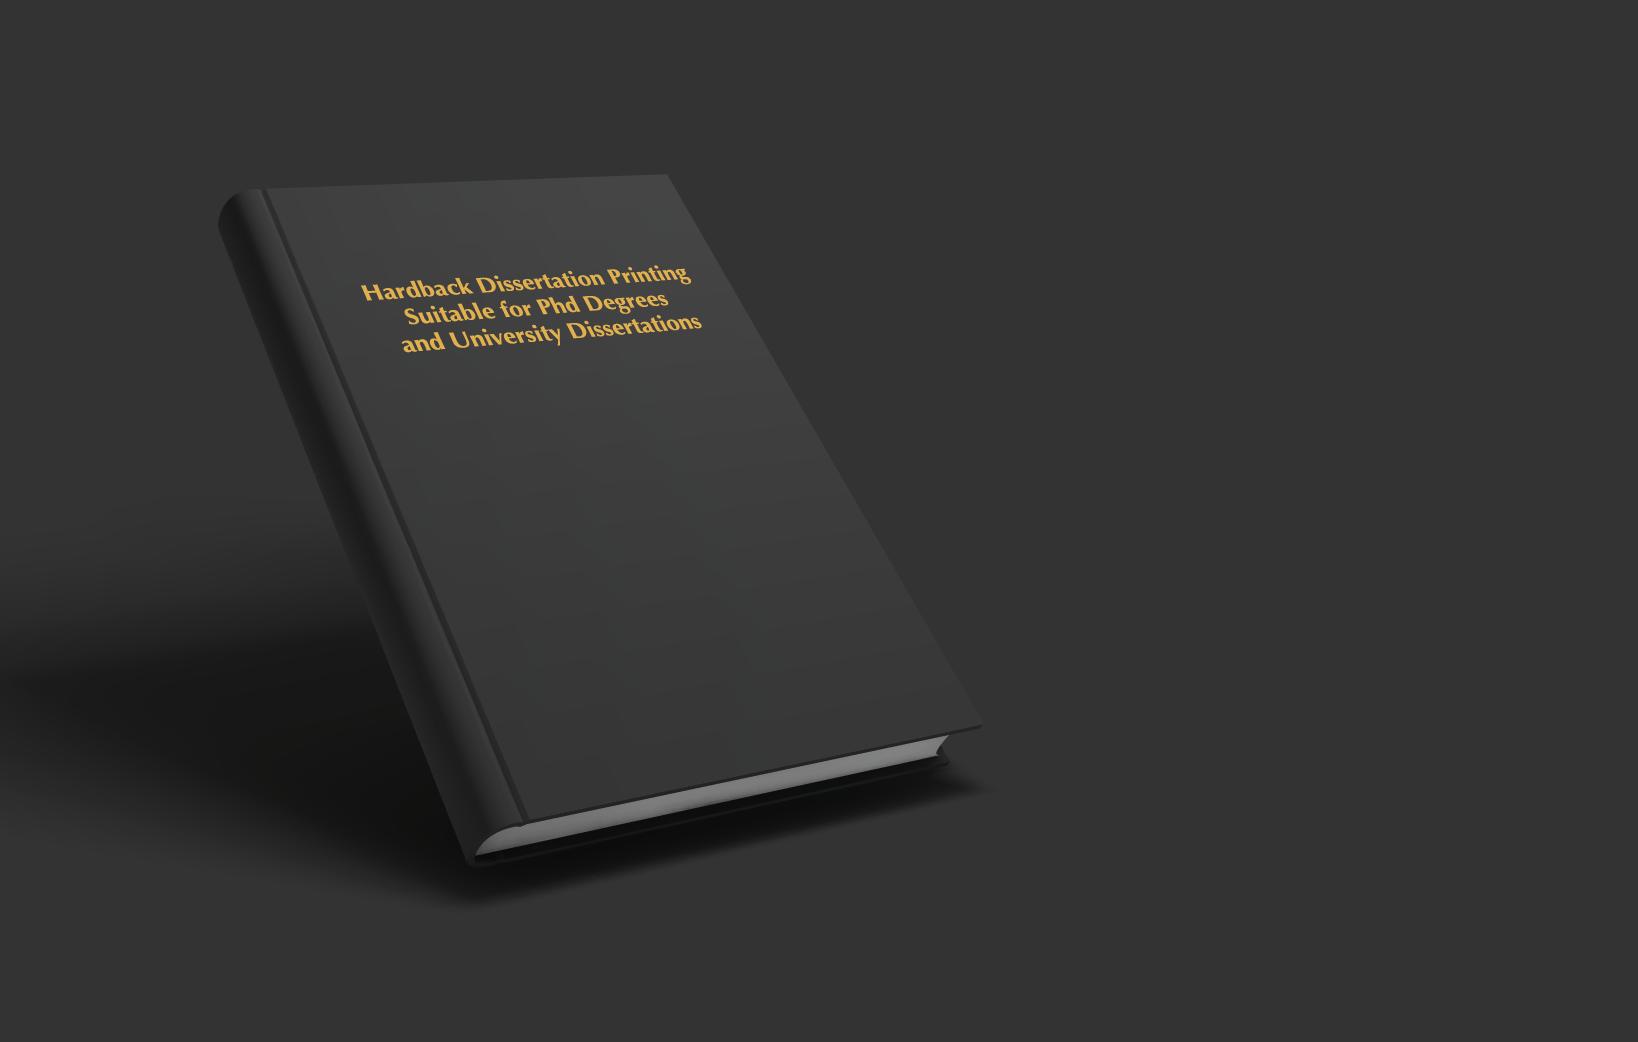 Hardback Dissertation Printing